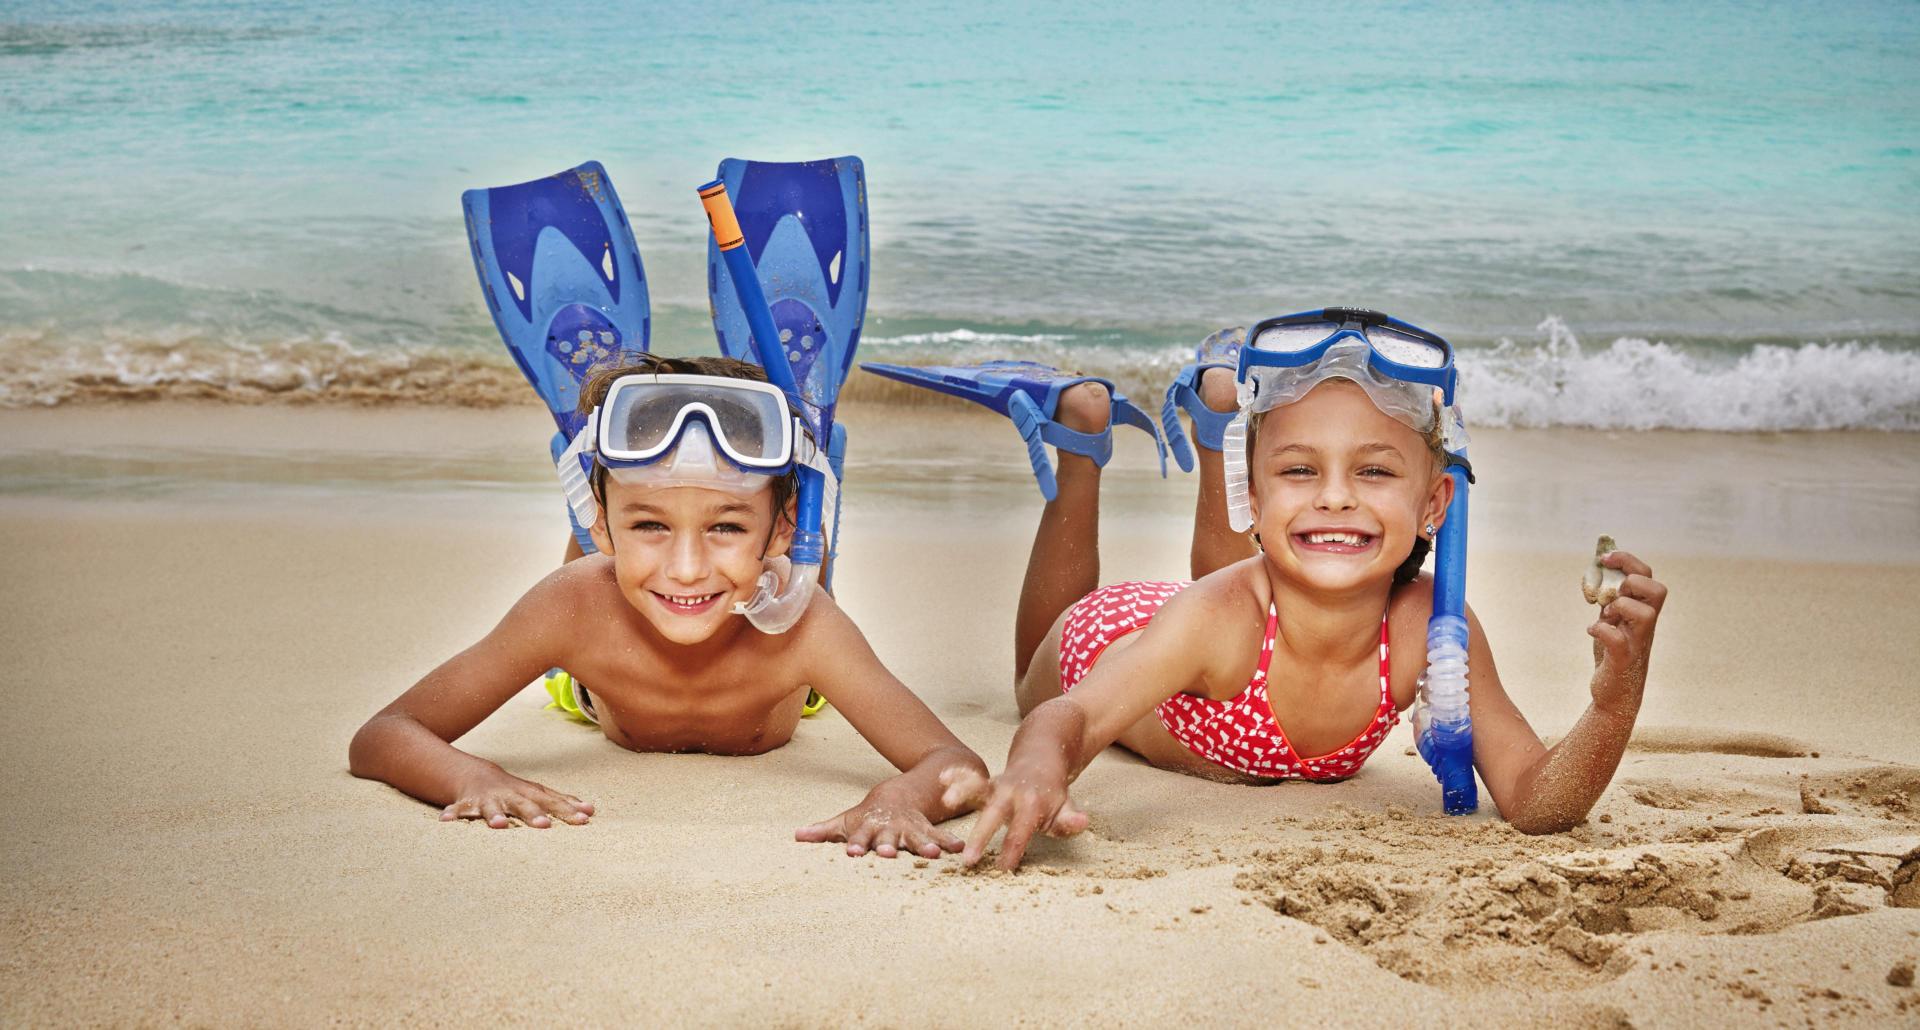 RCI_QN_Shoot_Snorkeling_Trip_2359